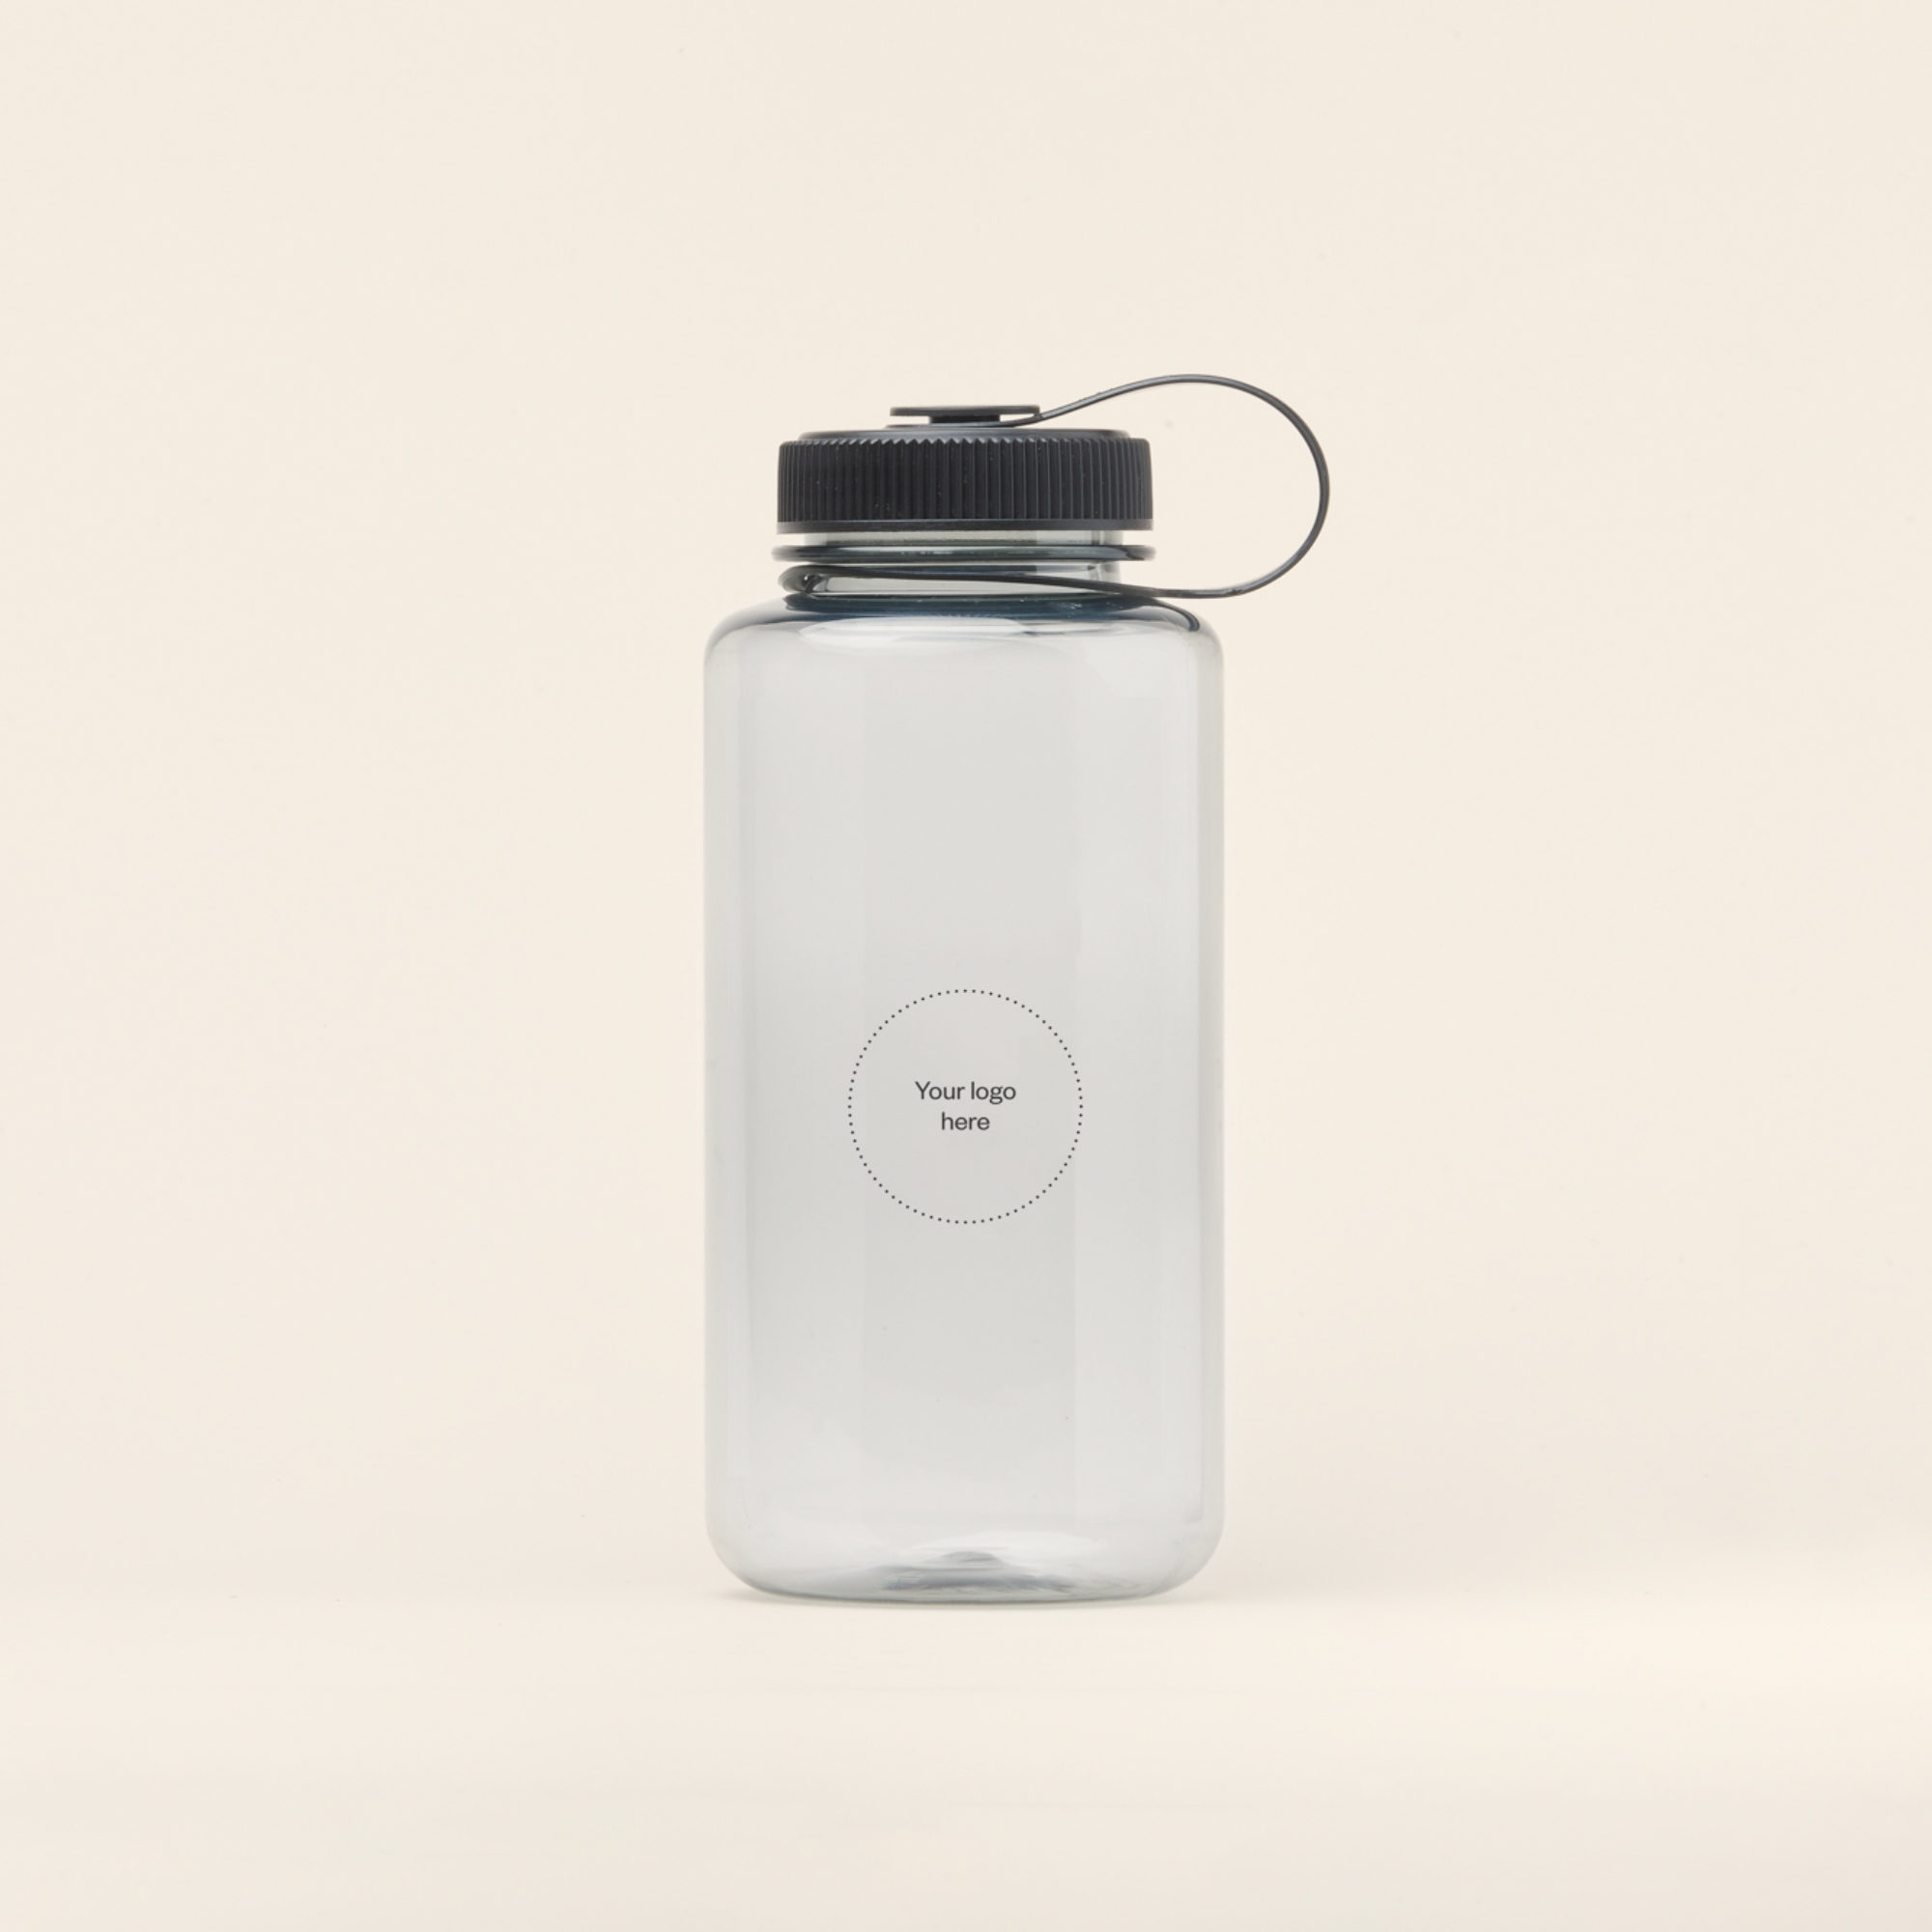 Merchery branded plastic bottle 1L light sustainable promotional product